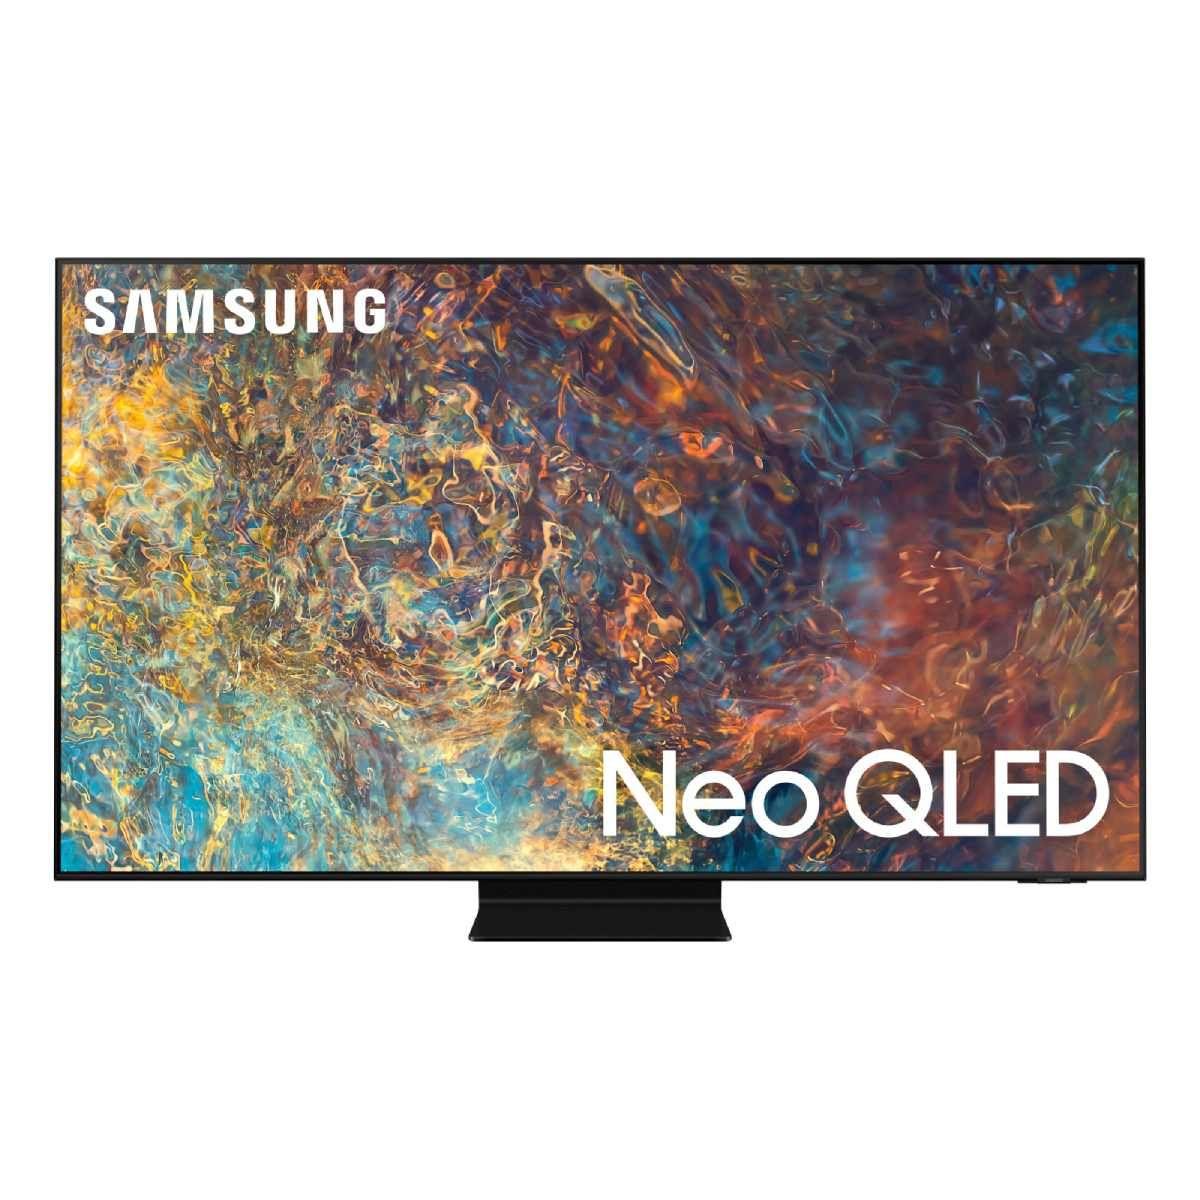 सैमसंग 50 इंच Neo QLED 4K Smart टीवी (QA50QN90AAKLXL)